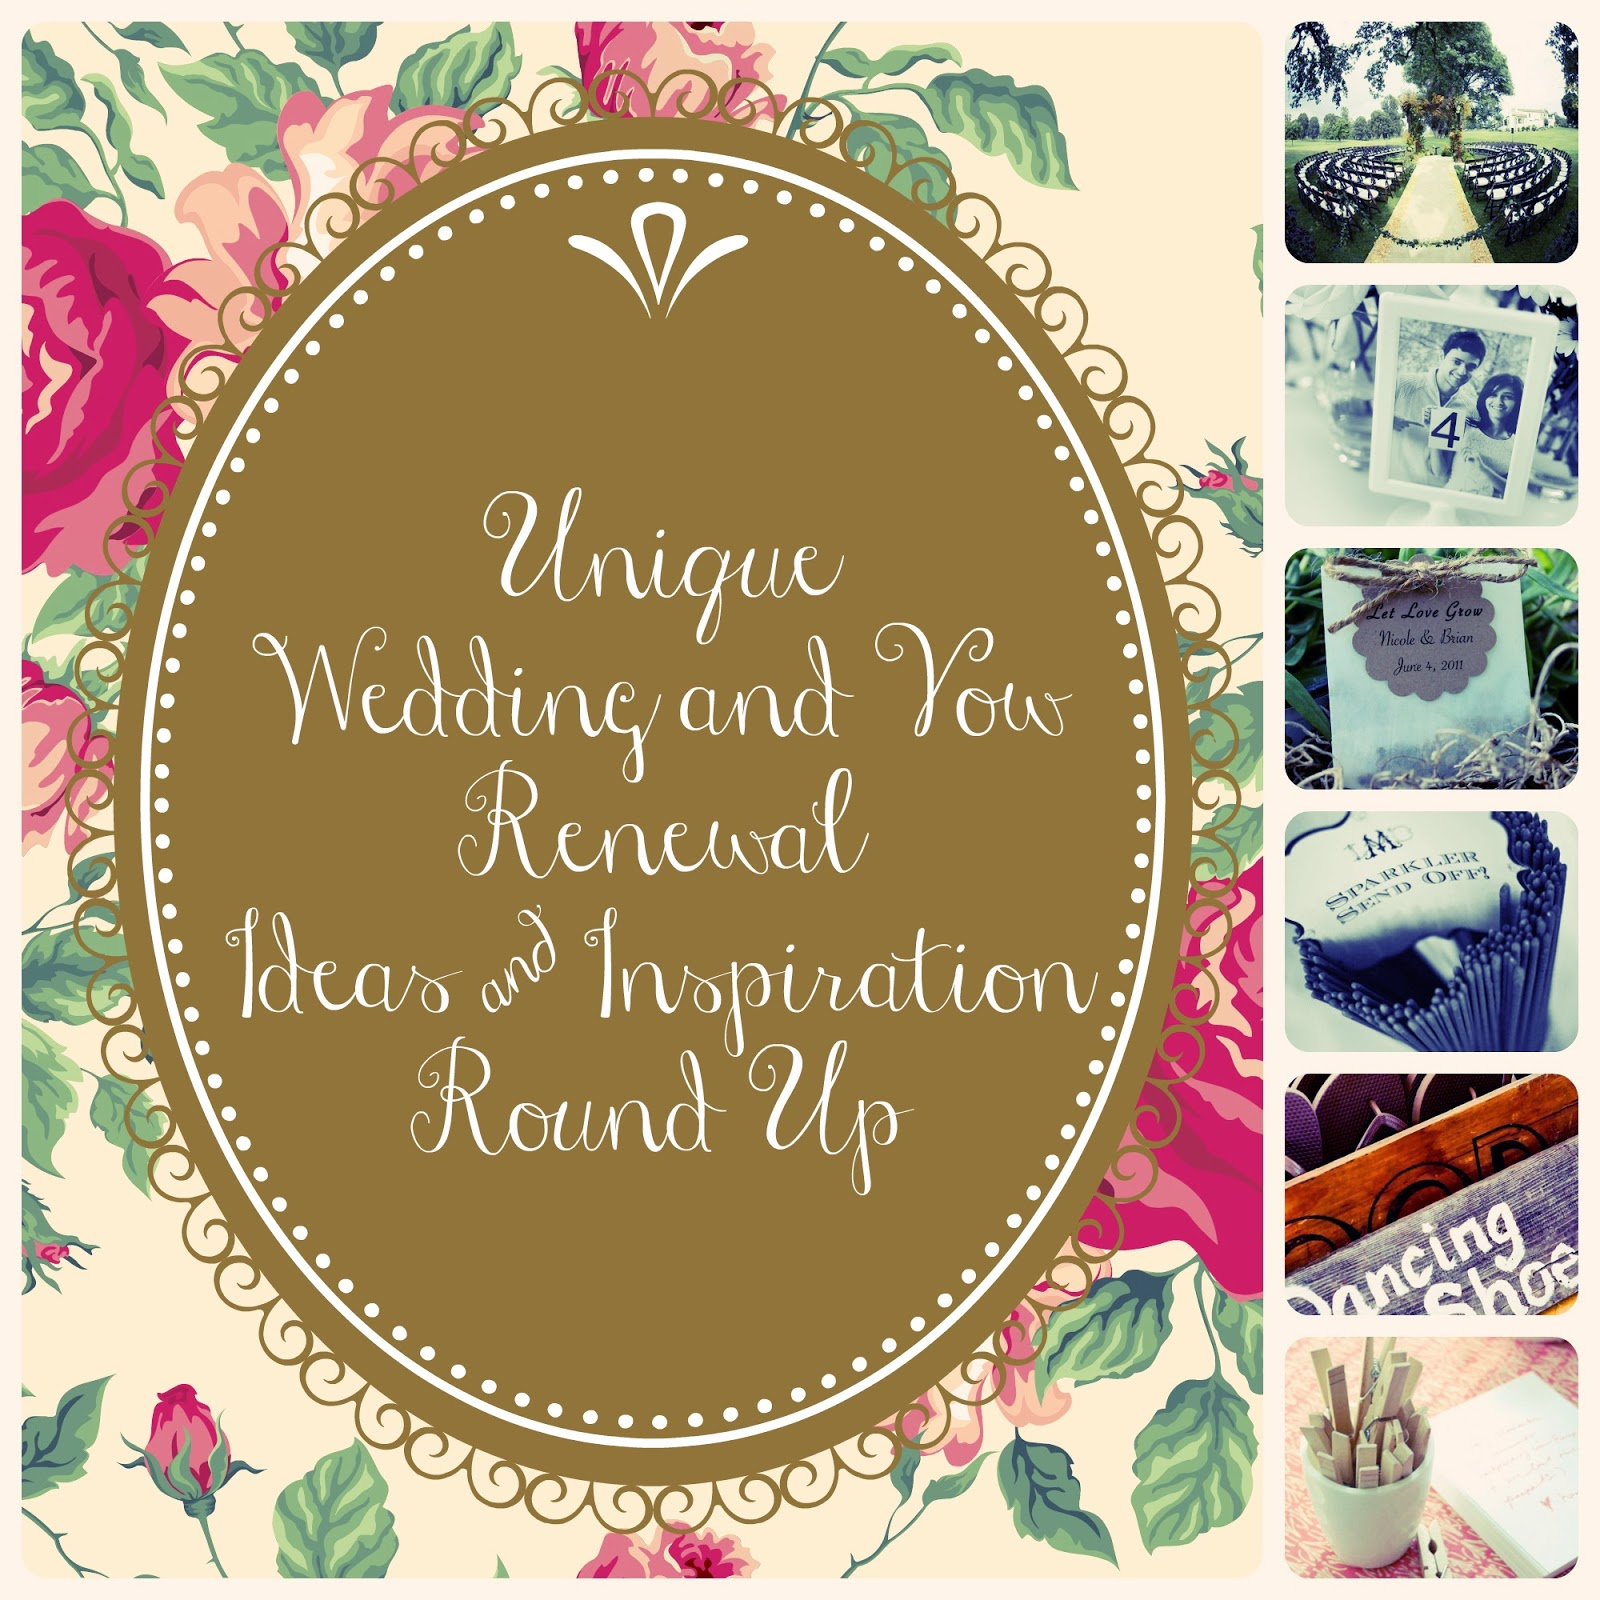 Wedding Renewal Gifts: Unique Wedding & Vow Renewal Ideas Round Up